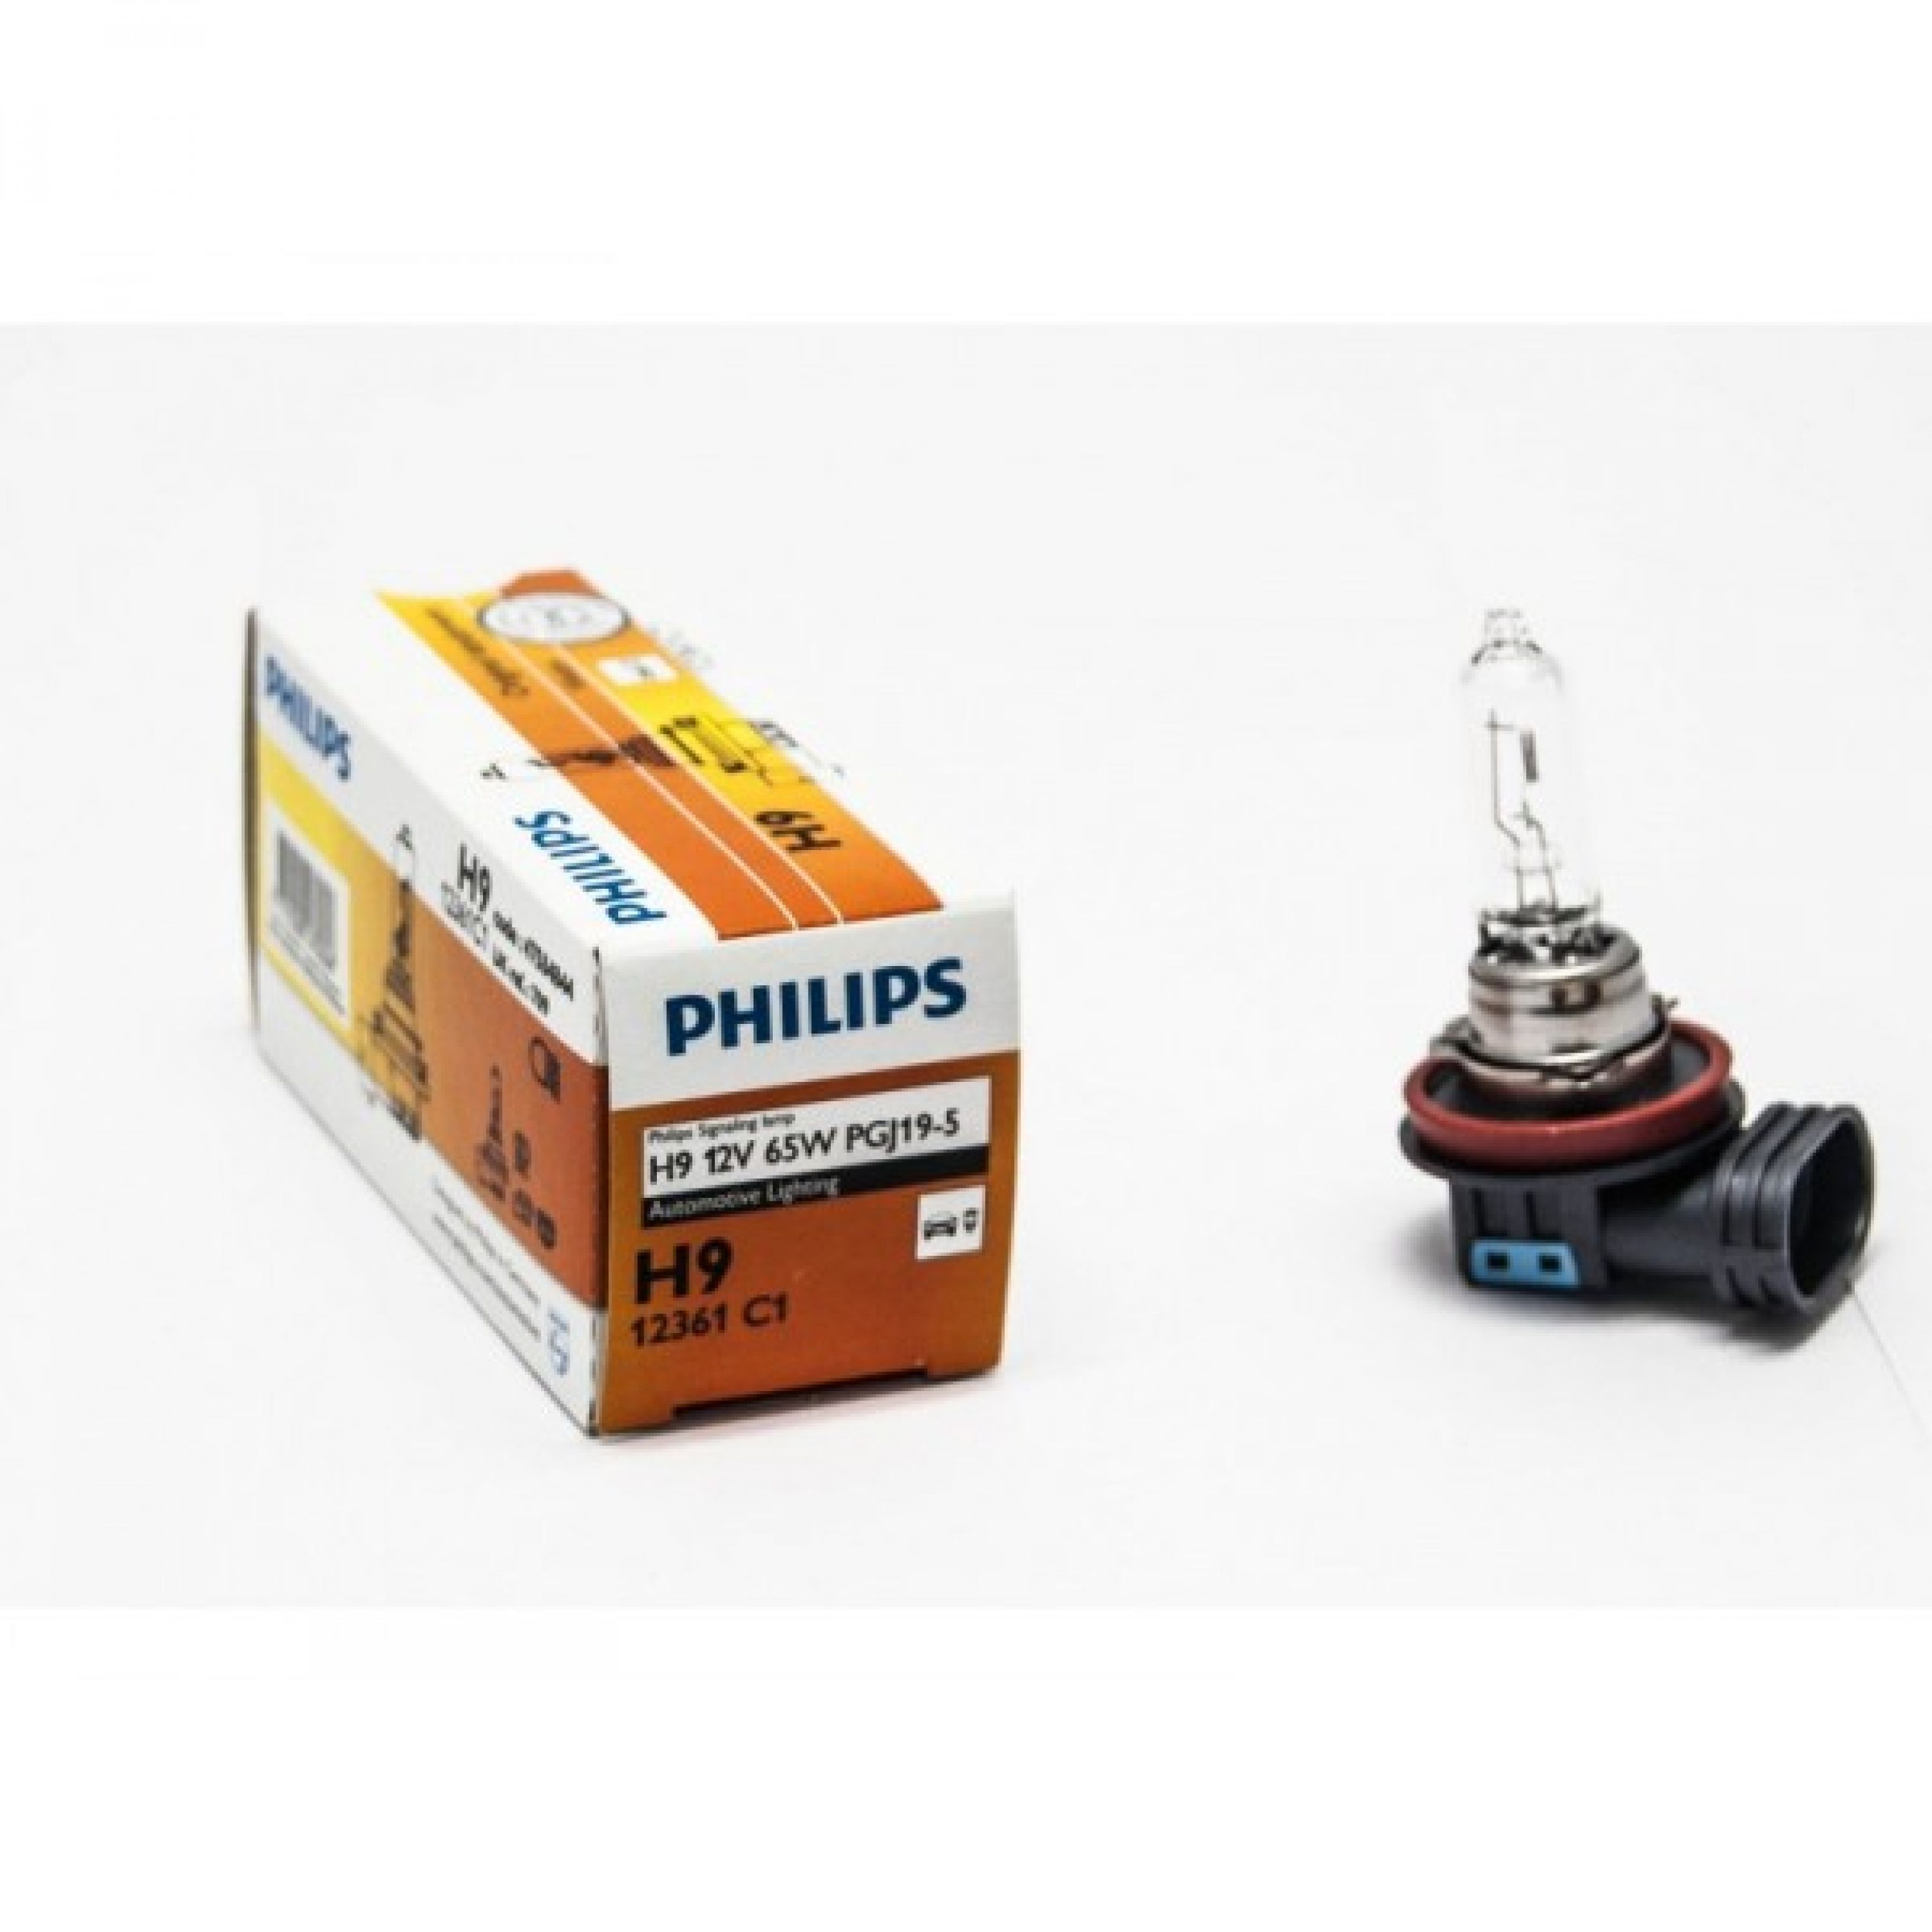 Автолампа Philips H9 Standard (12V 65W PGJ19-5)